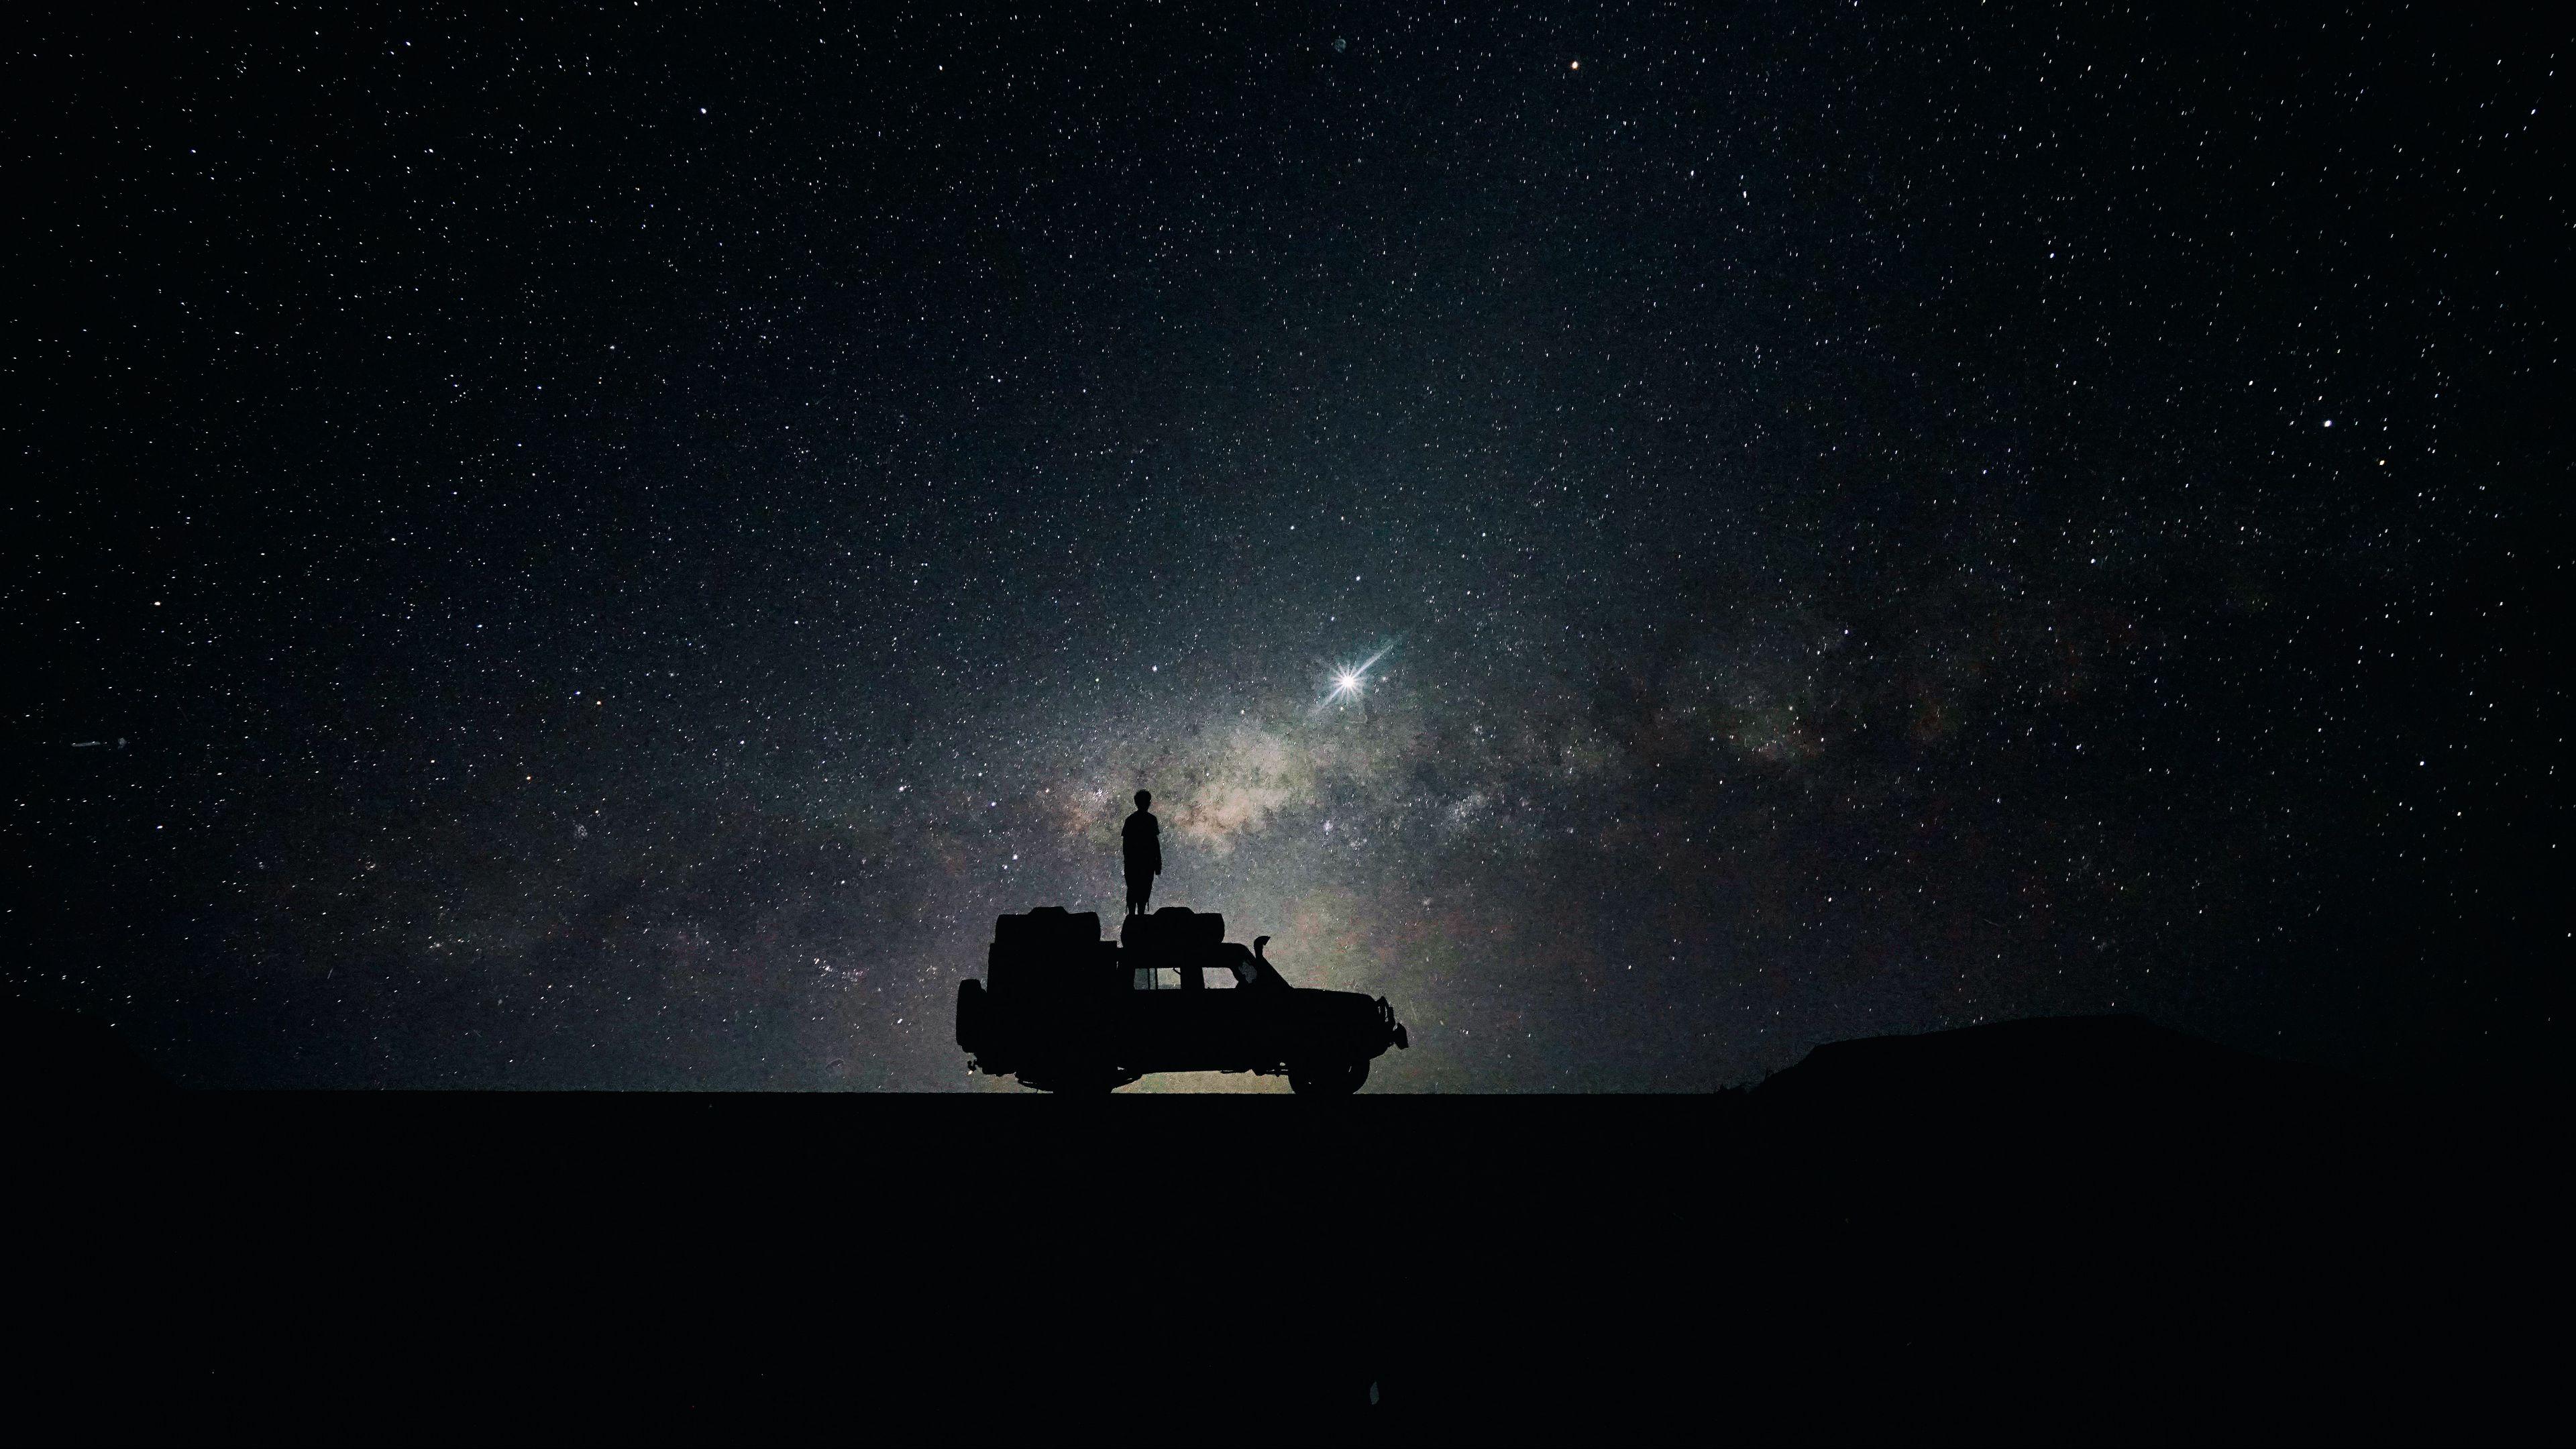 Hd wallpaper ultra - Preview Wallpaper Stars Sky Space Car 3840x2160